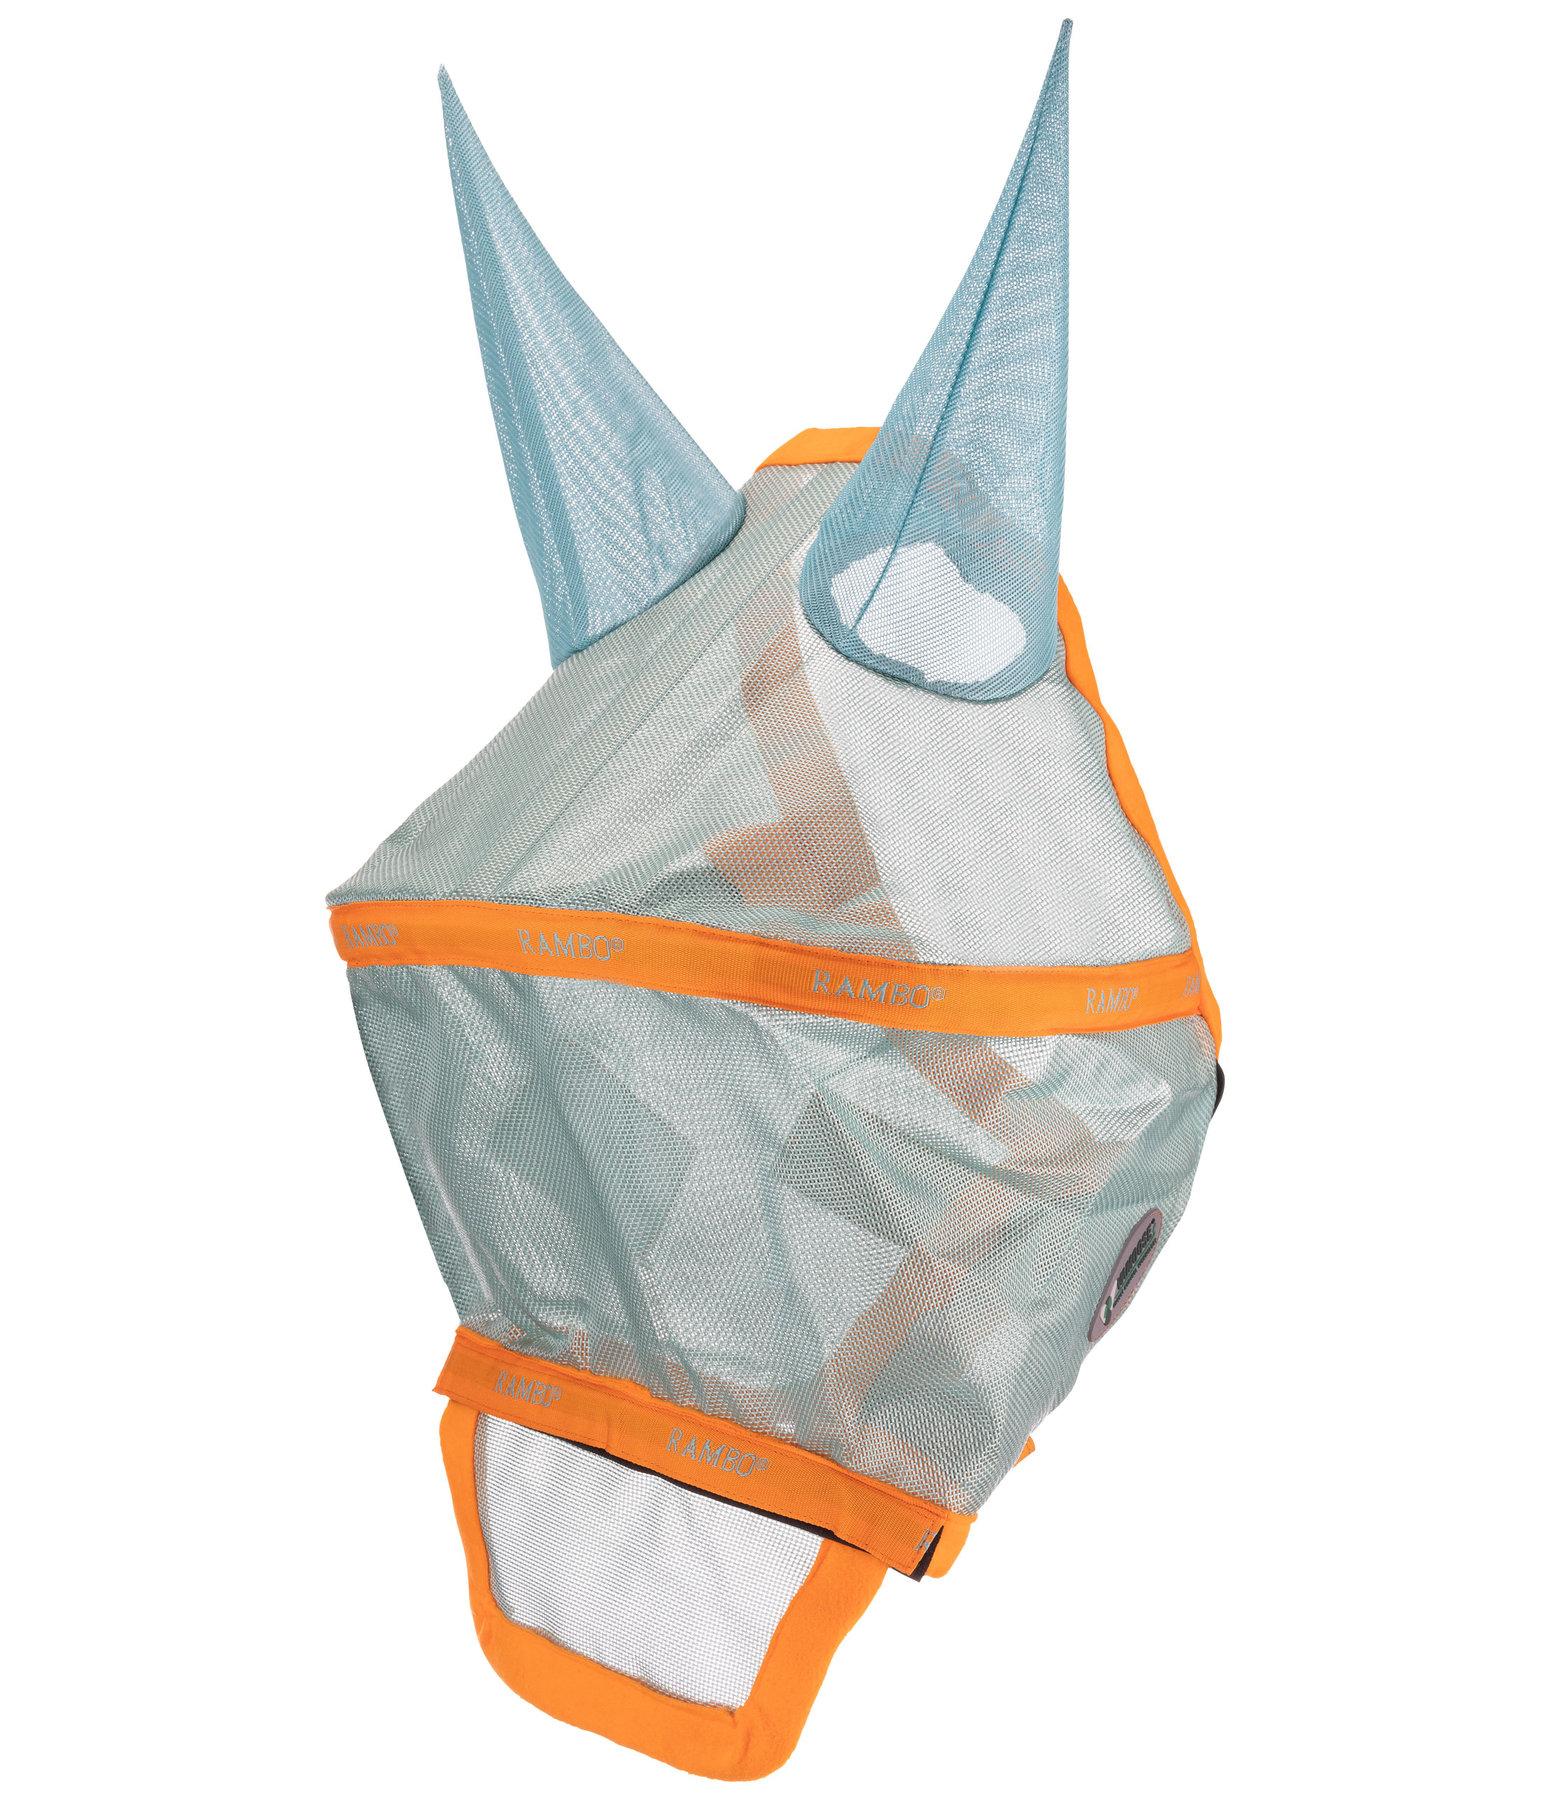 eb5627fa4fff03 Masque anti-mouches RAMBO Plus Vamoose